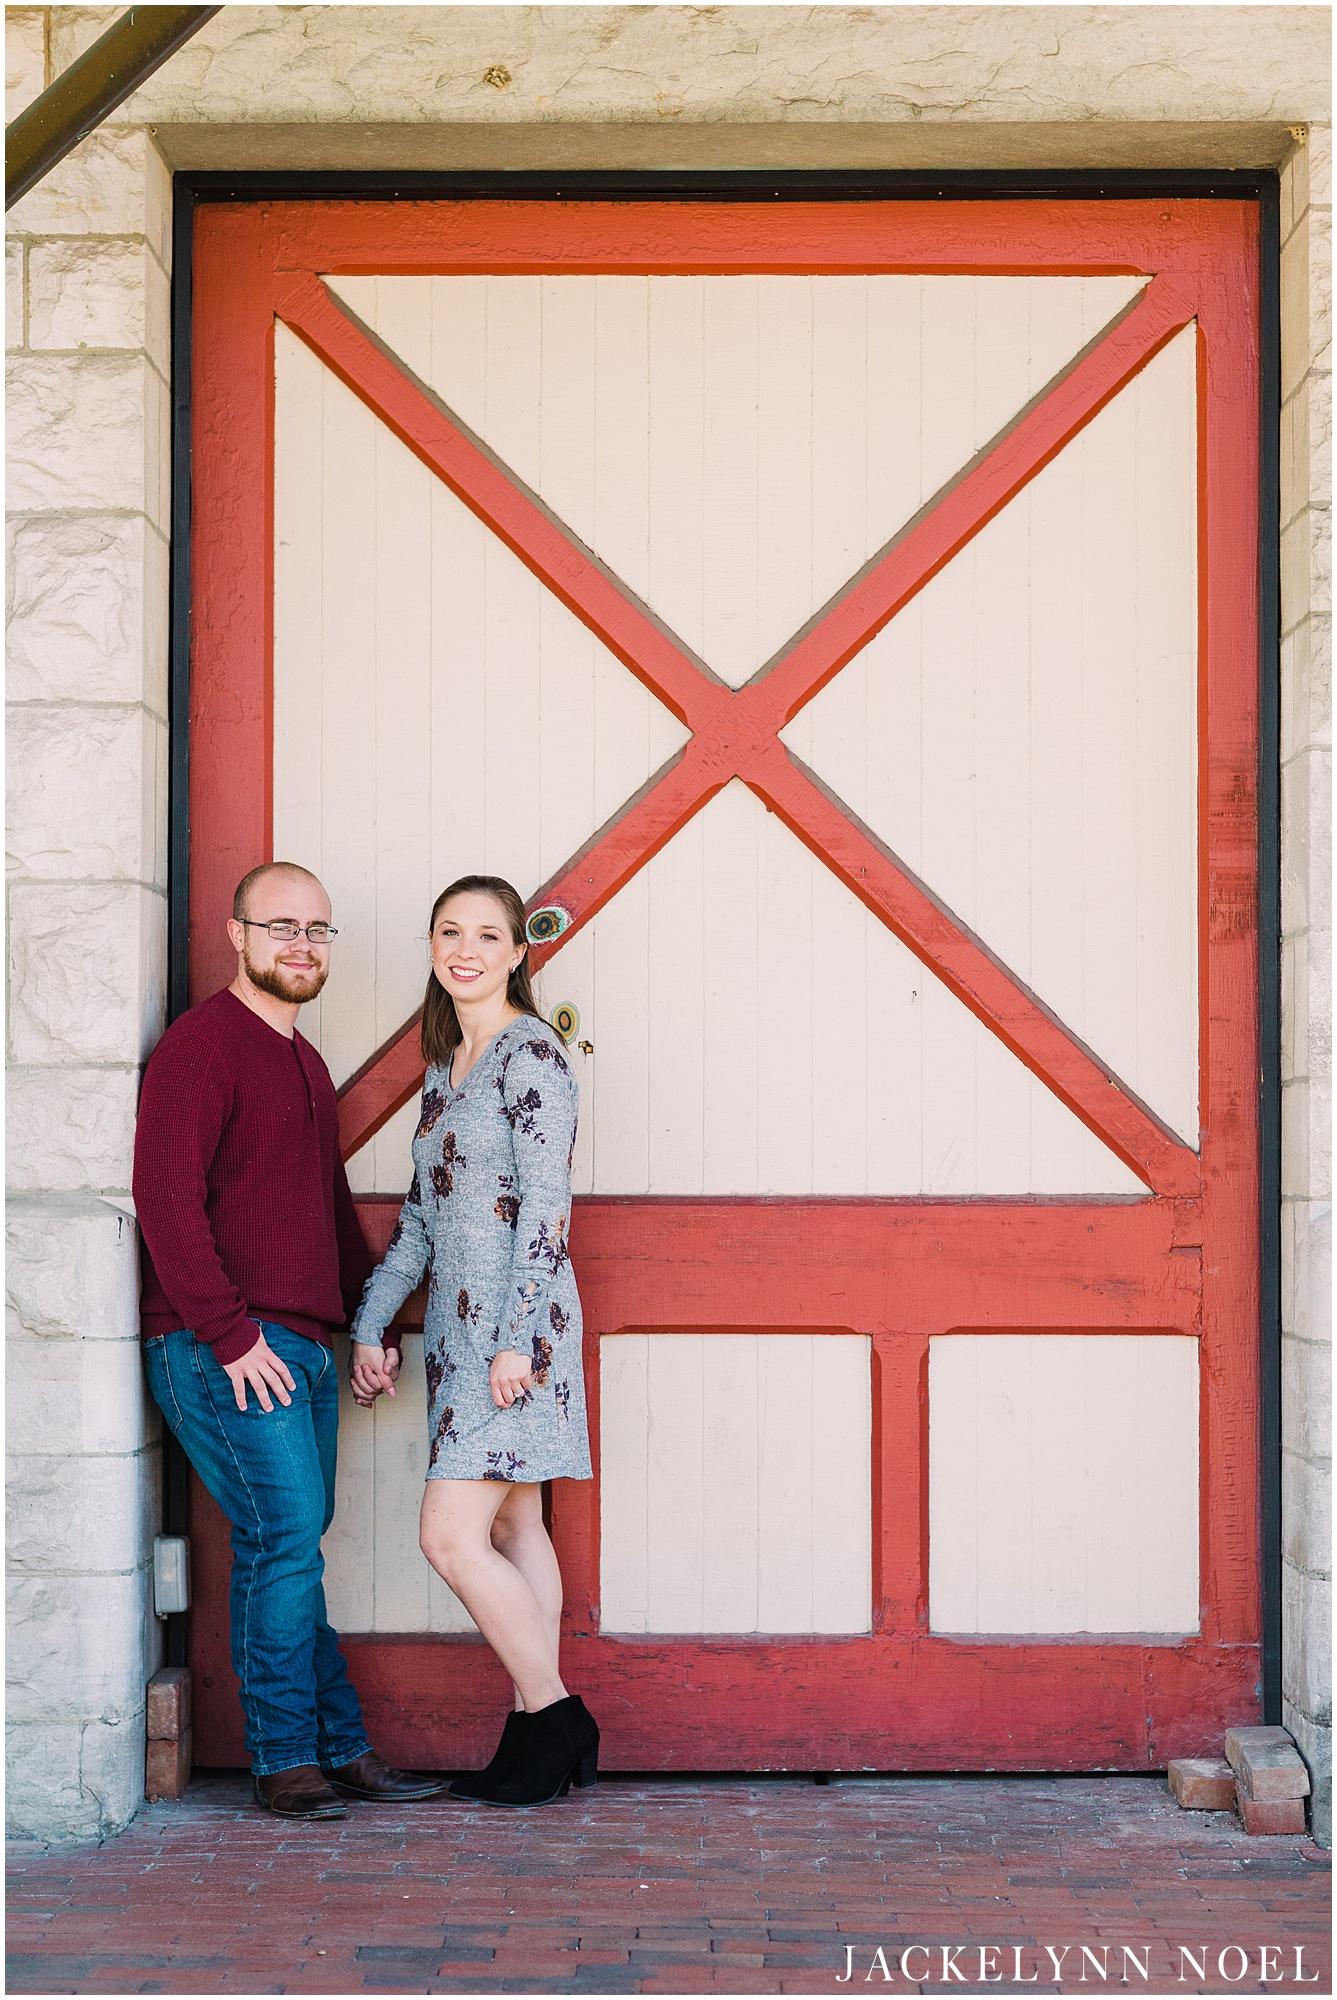 Rebecca & Jake - Kirkwood, Missouri Engagement Session by Jackelynn Noel Photography